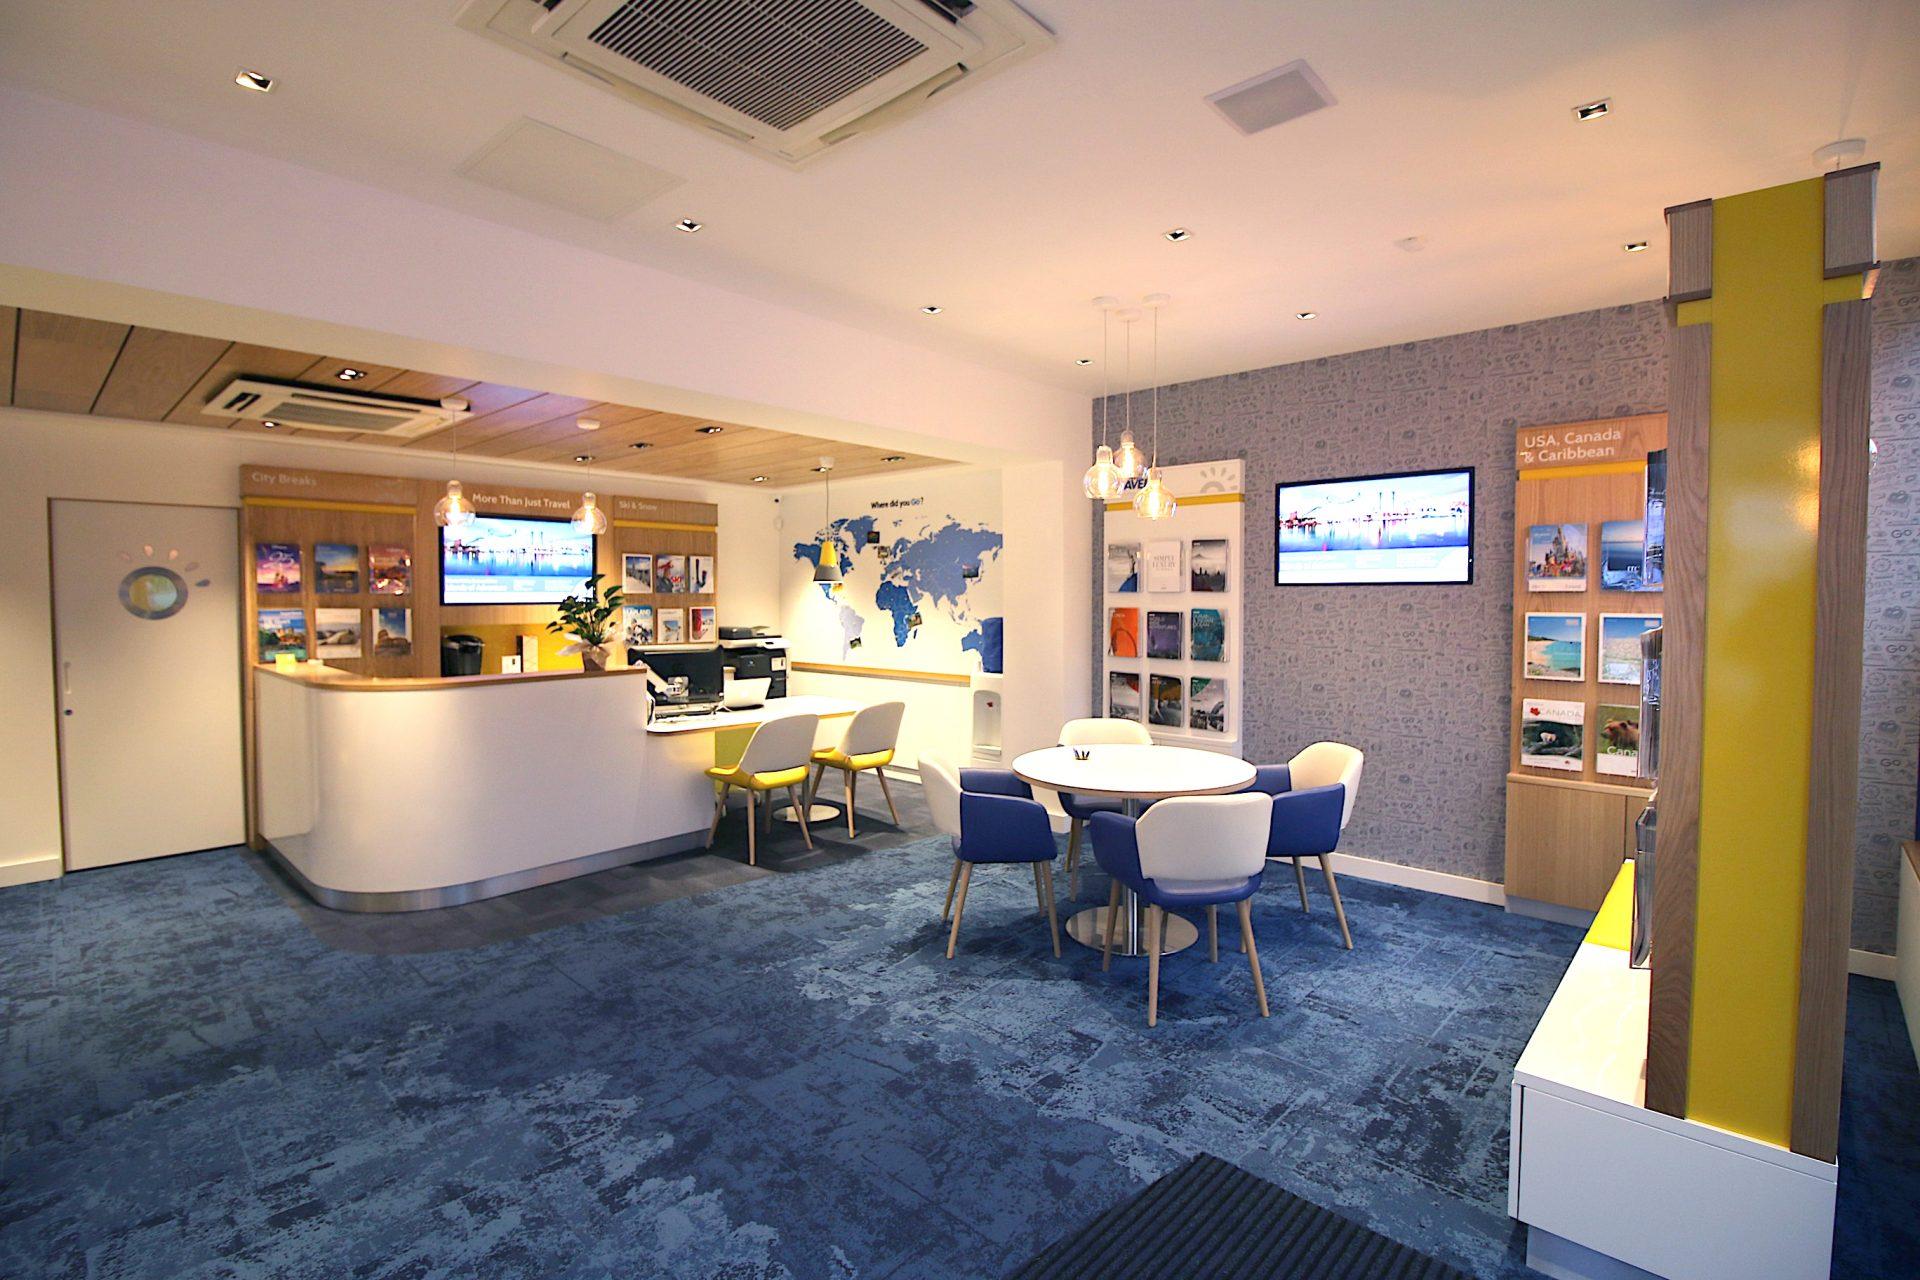 Go Travel_Chislhrust_Interior Design By Nugget Design 17